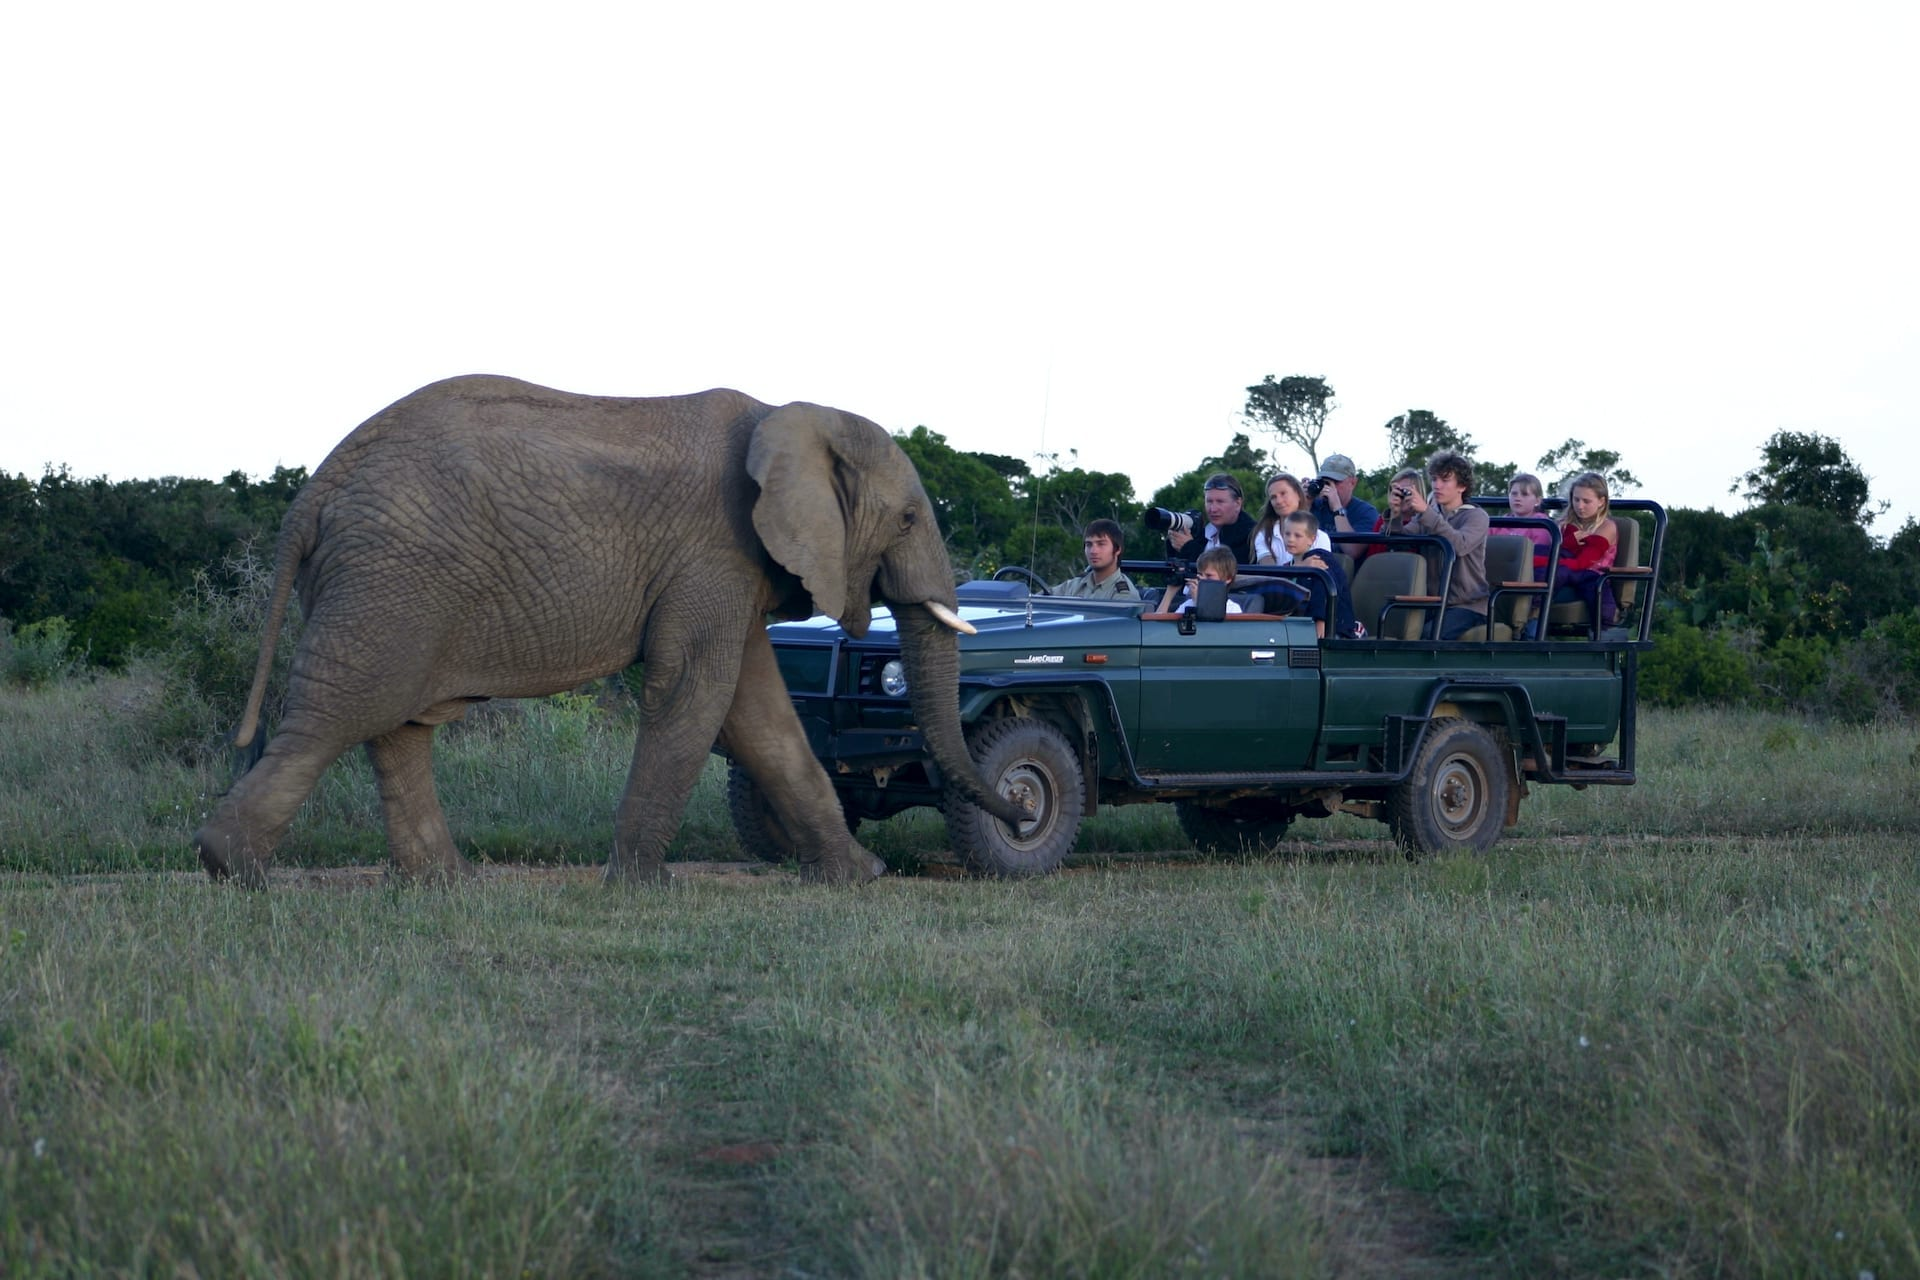 # FOTO - kariege safari 2 kopie